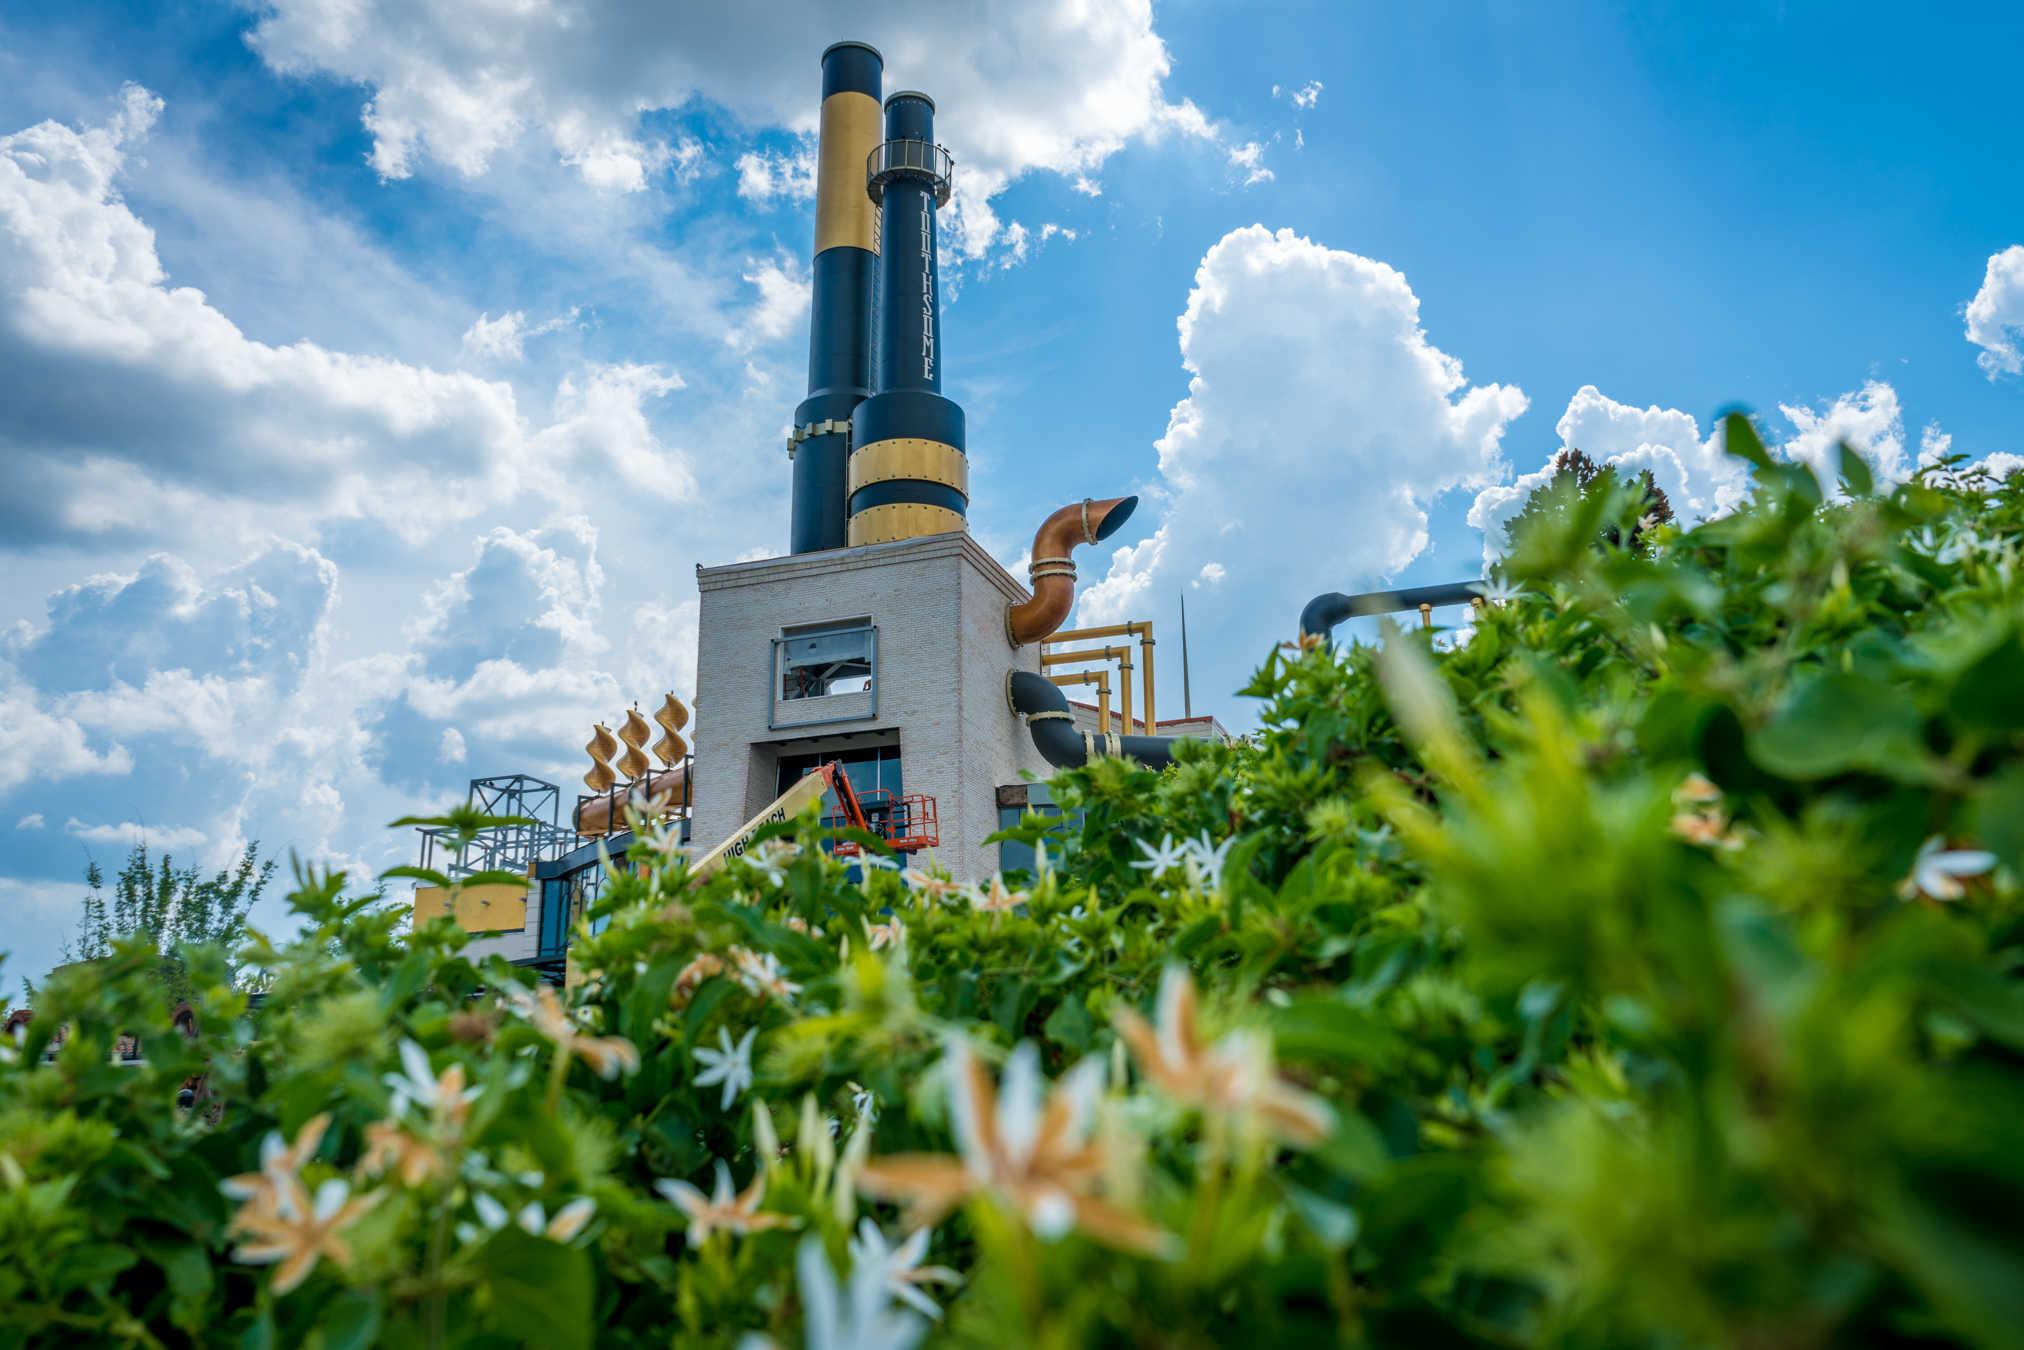 Toothsome Chocolate Emporium begins to take shape at Universal Orlando